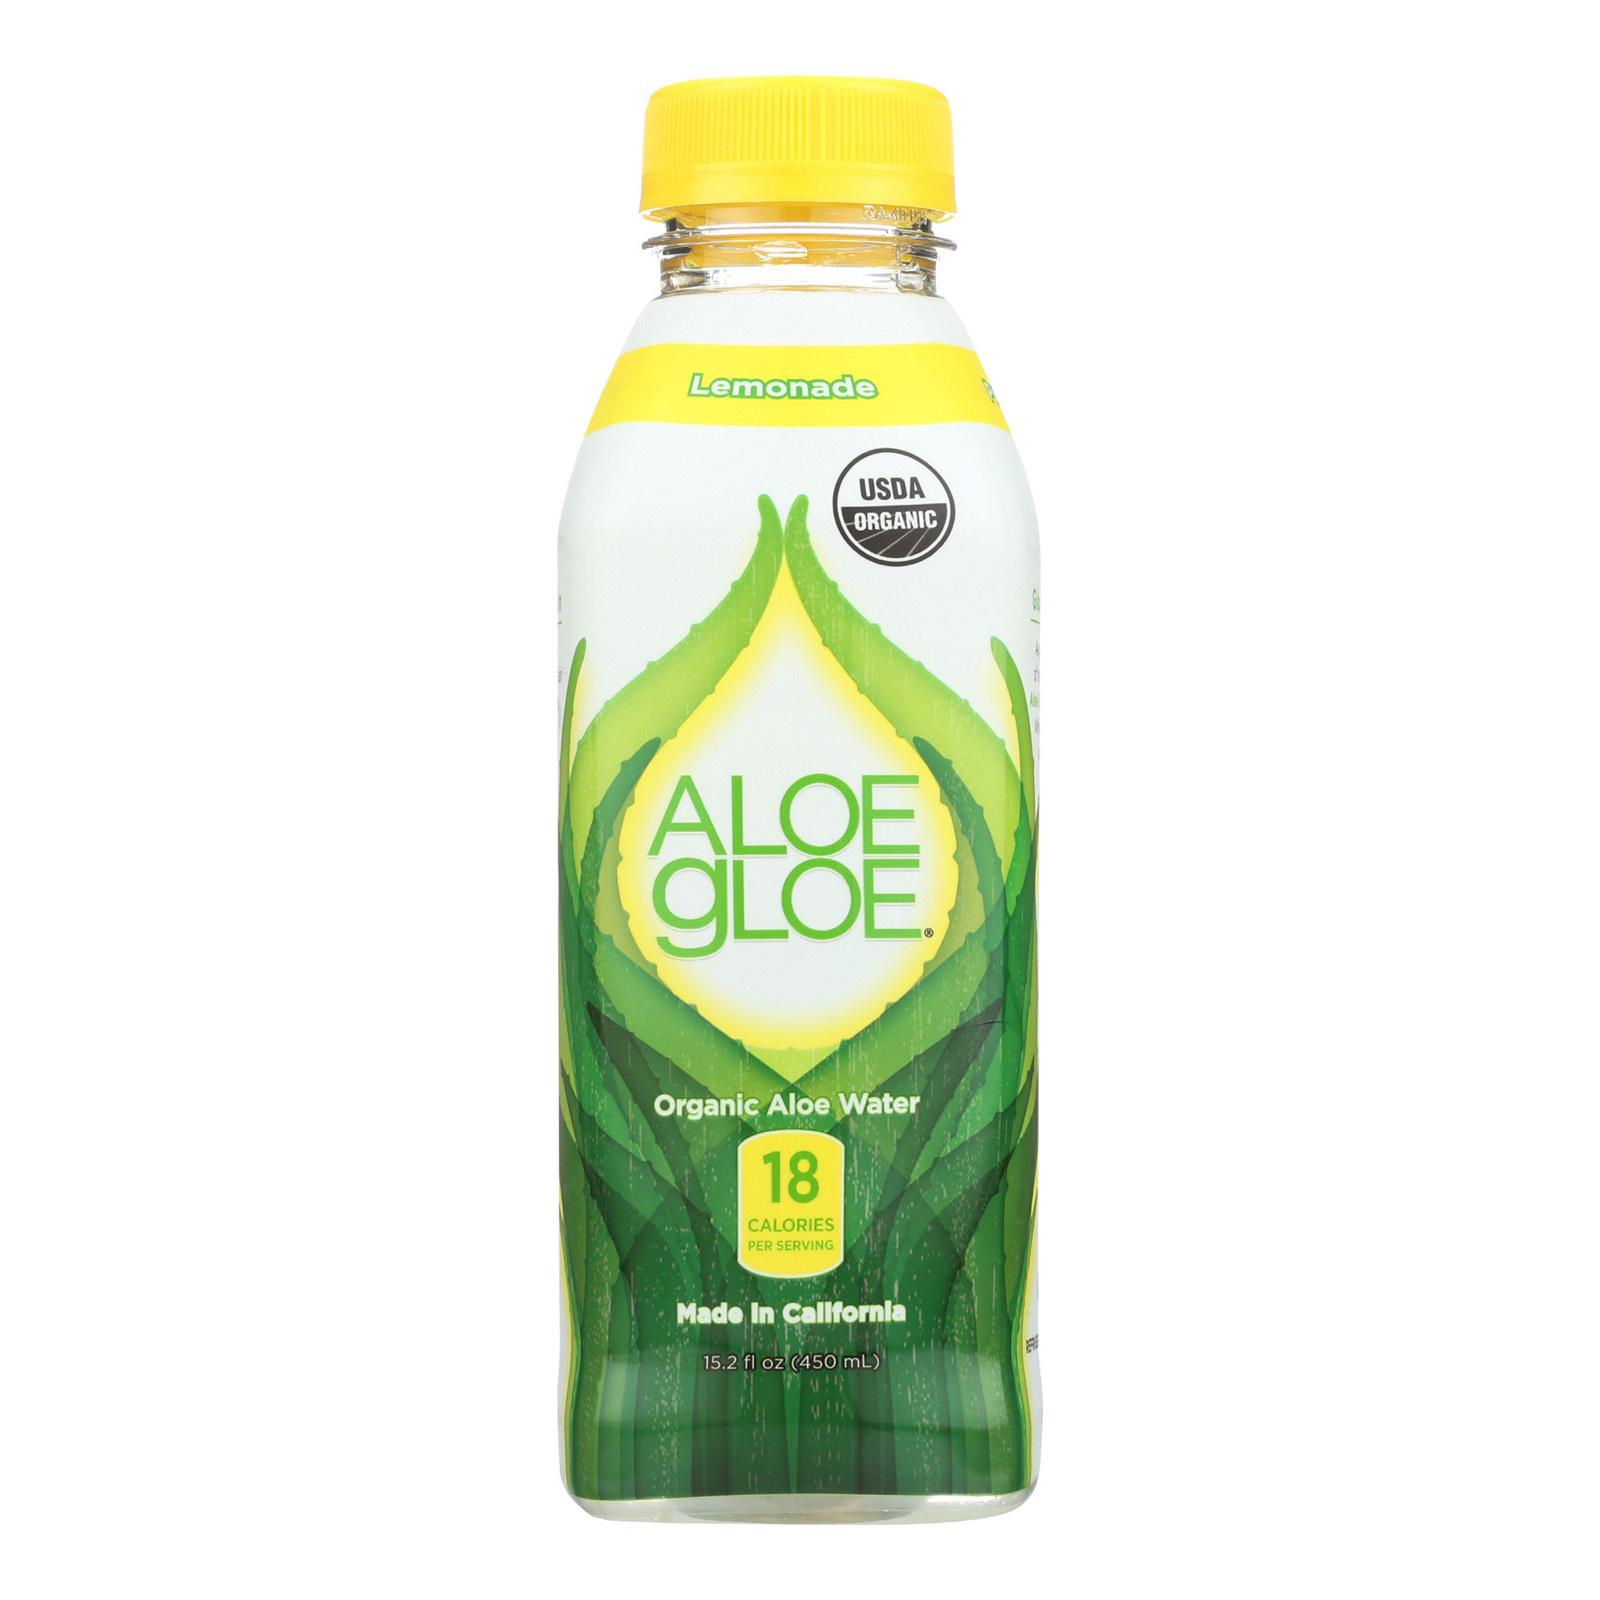 Aloe Gloe Lemonade Organic Aloe Water - Case of 12 - 15.2 fl oz.